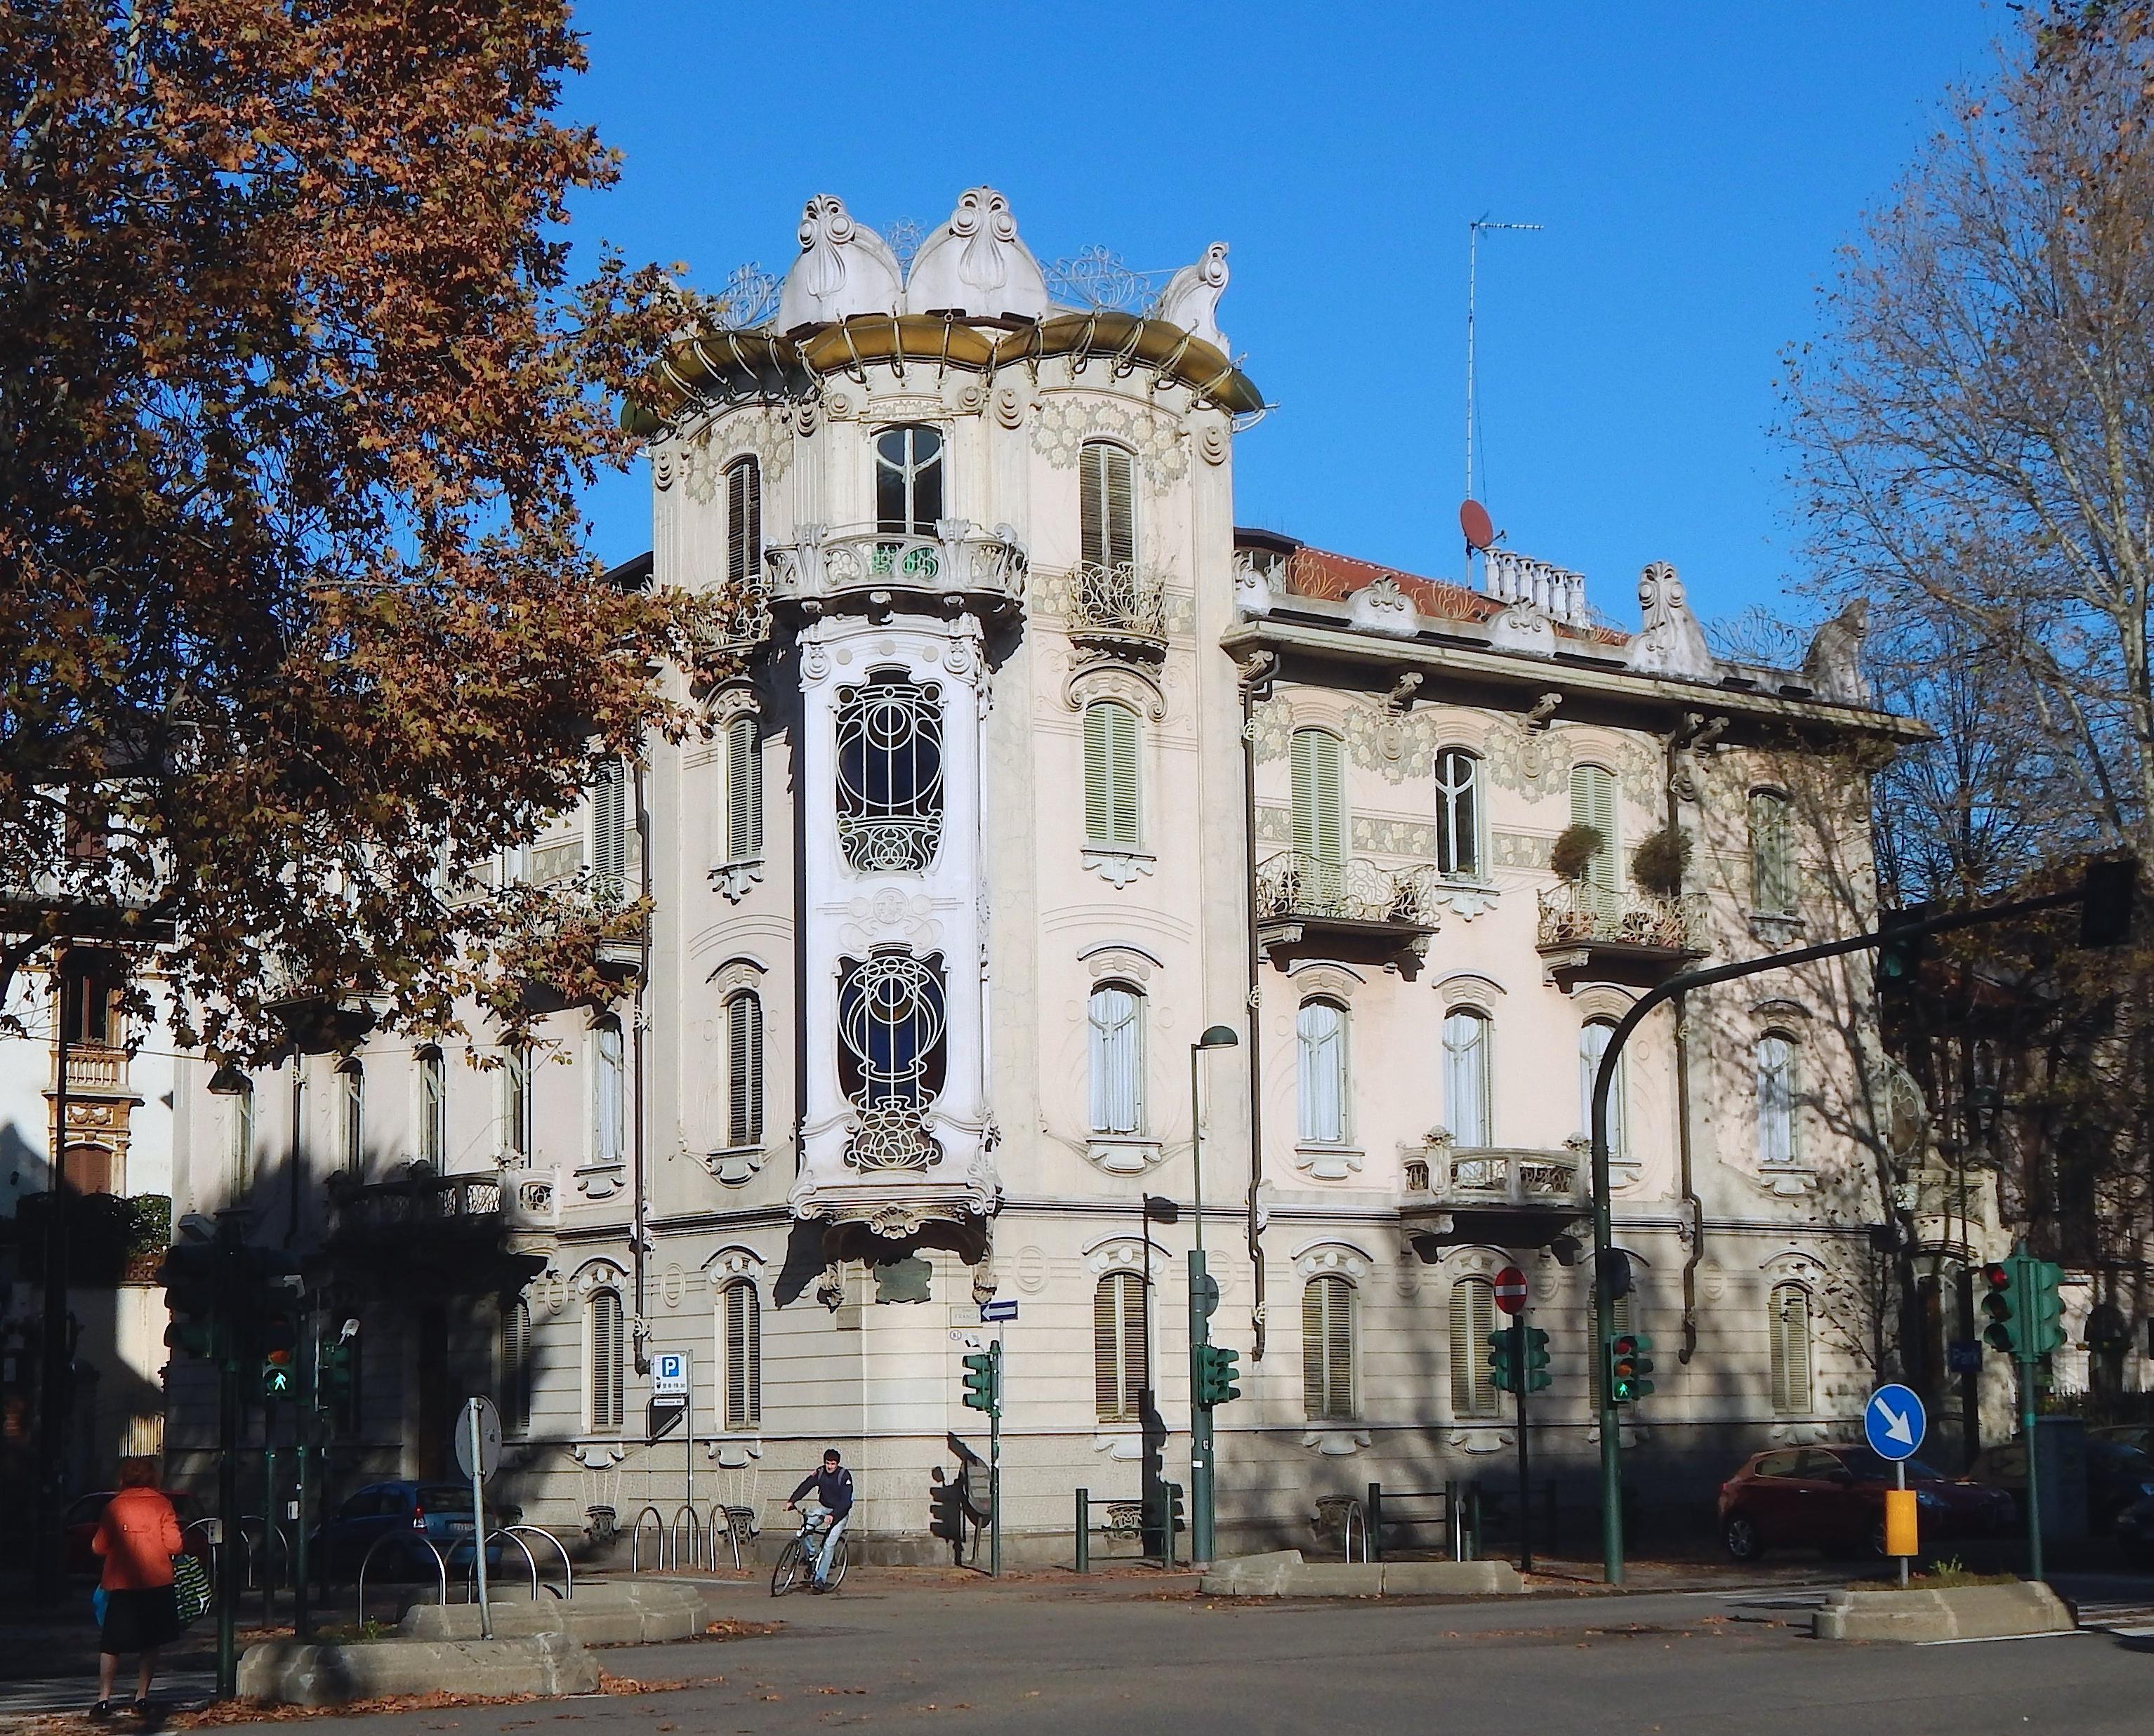 Attico Villa San Martino Pesaro